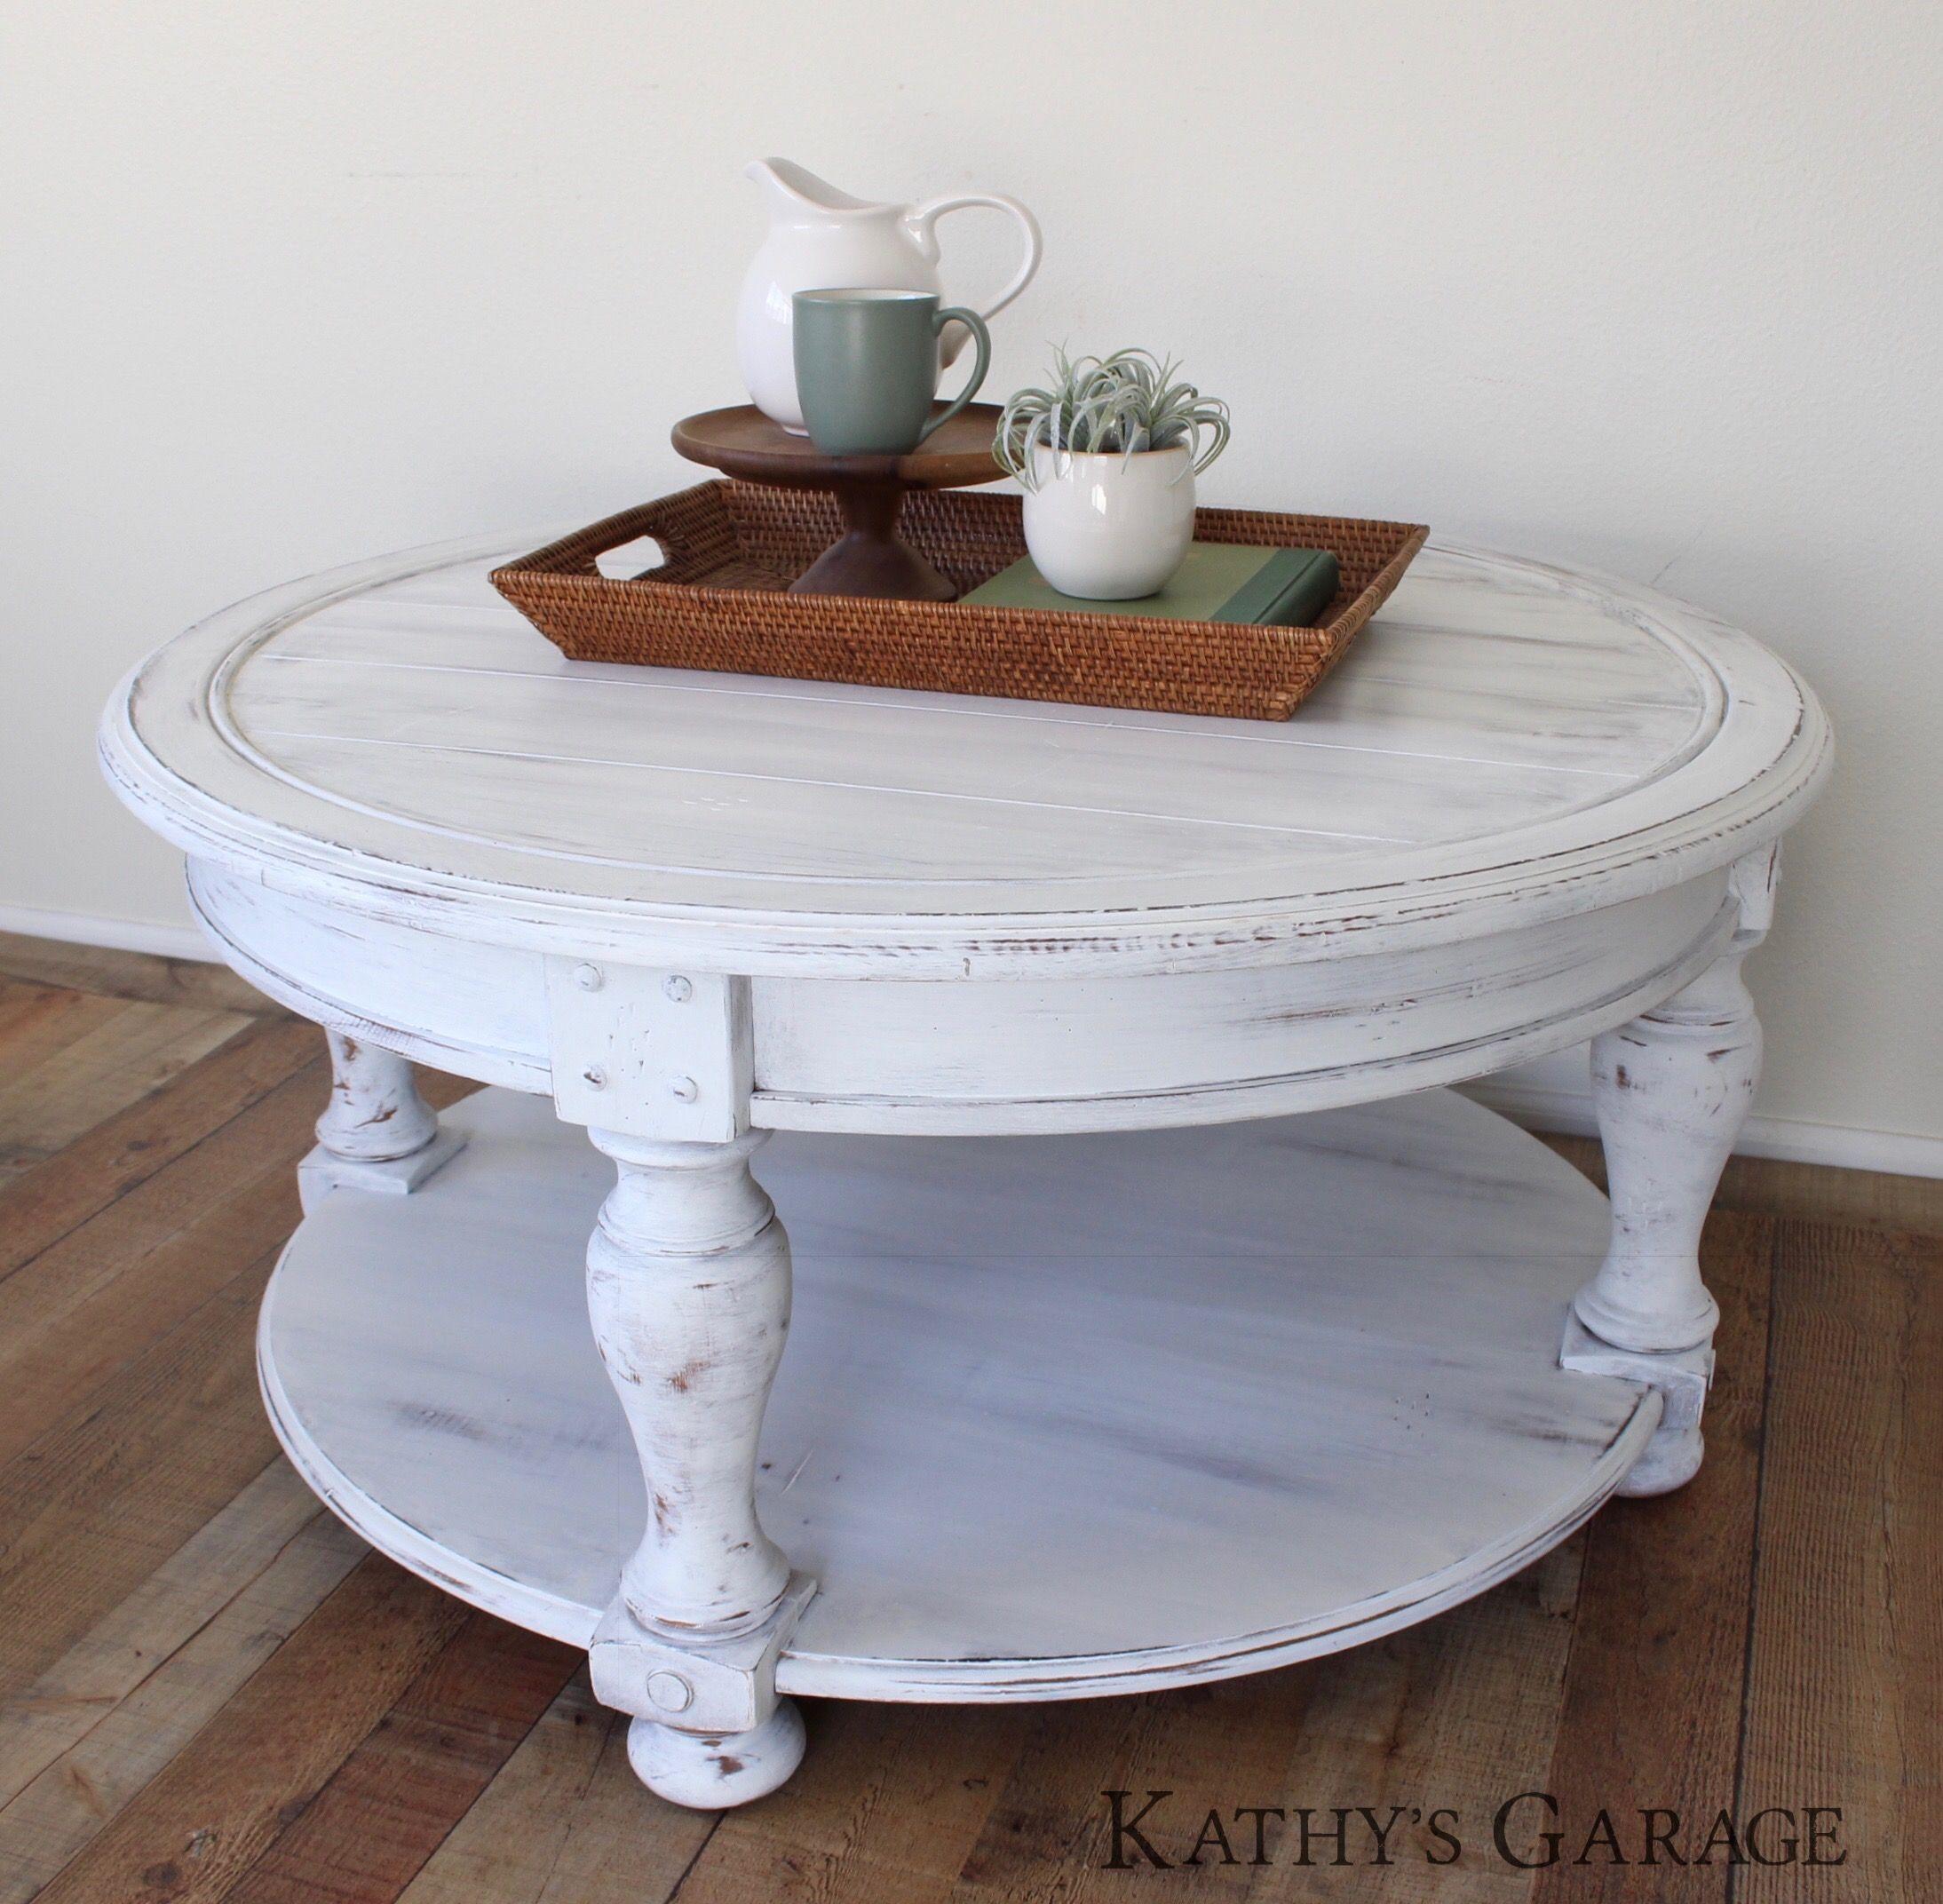 White Coffee Table Farmhouse Coffee Table Round Coffee Table Shiplap Distressed Ta Coffee Table Farmhouse Chalk Paint Coffee Table White Round Coffee Table